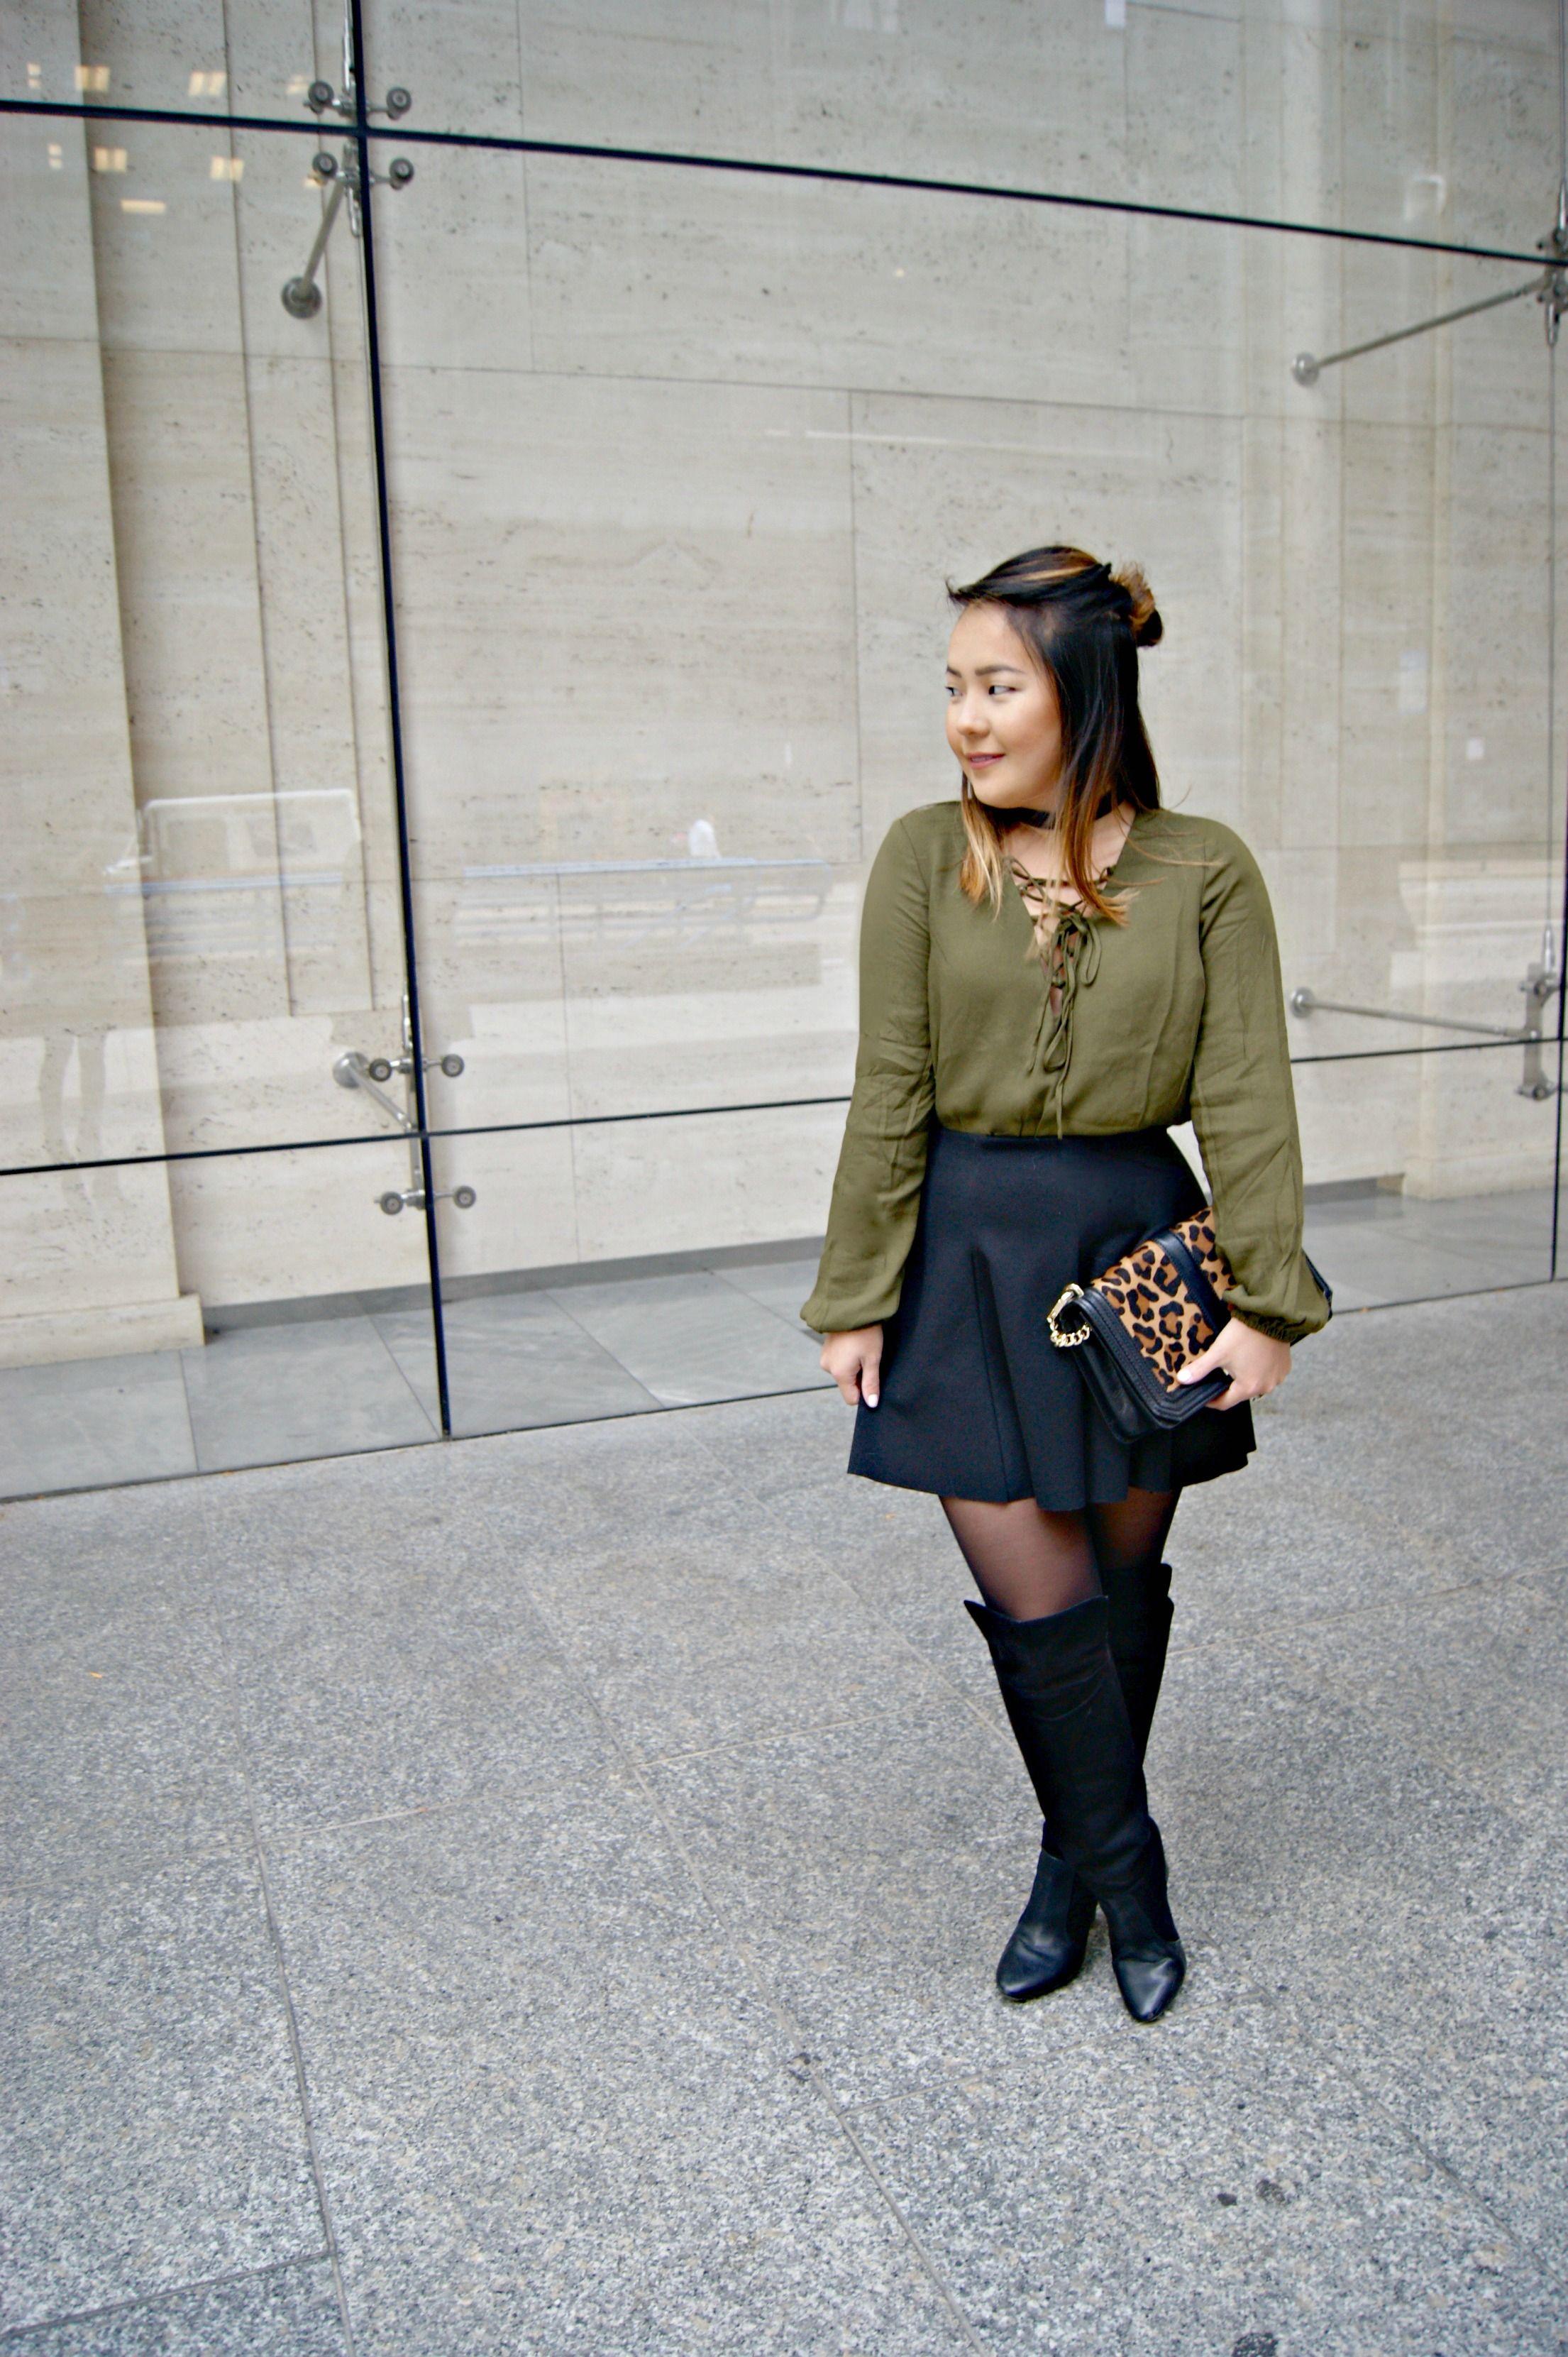 e5945506e3 Olive lace up top, black choker, black skirt, black over the knee boots,  leopard bag.